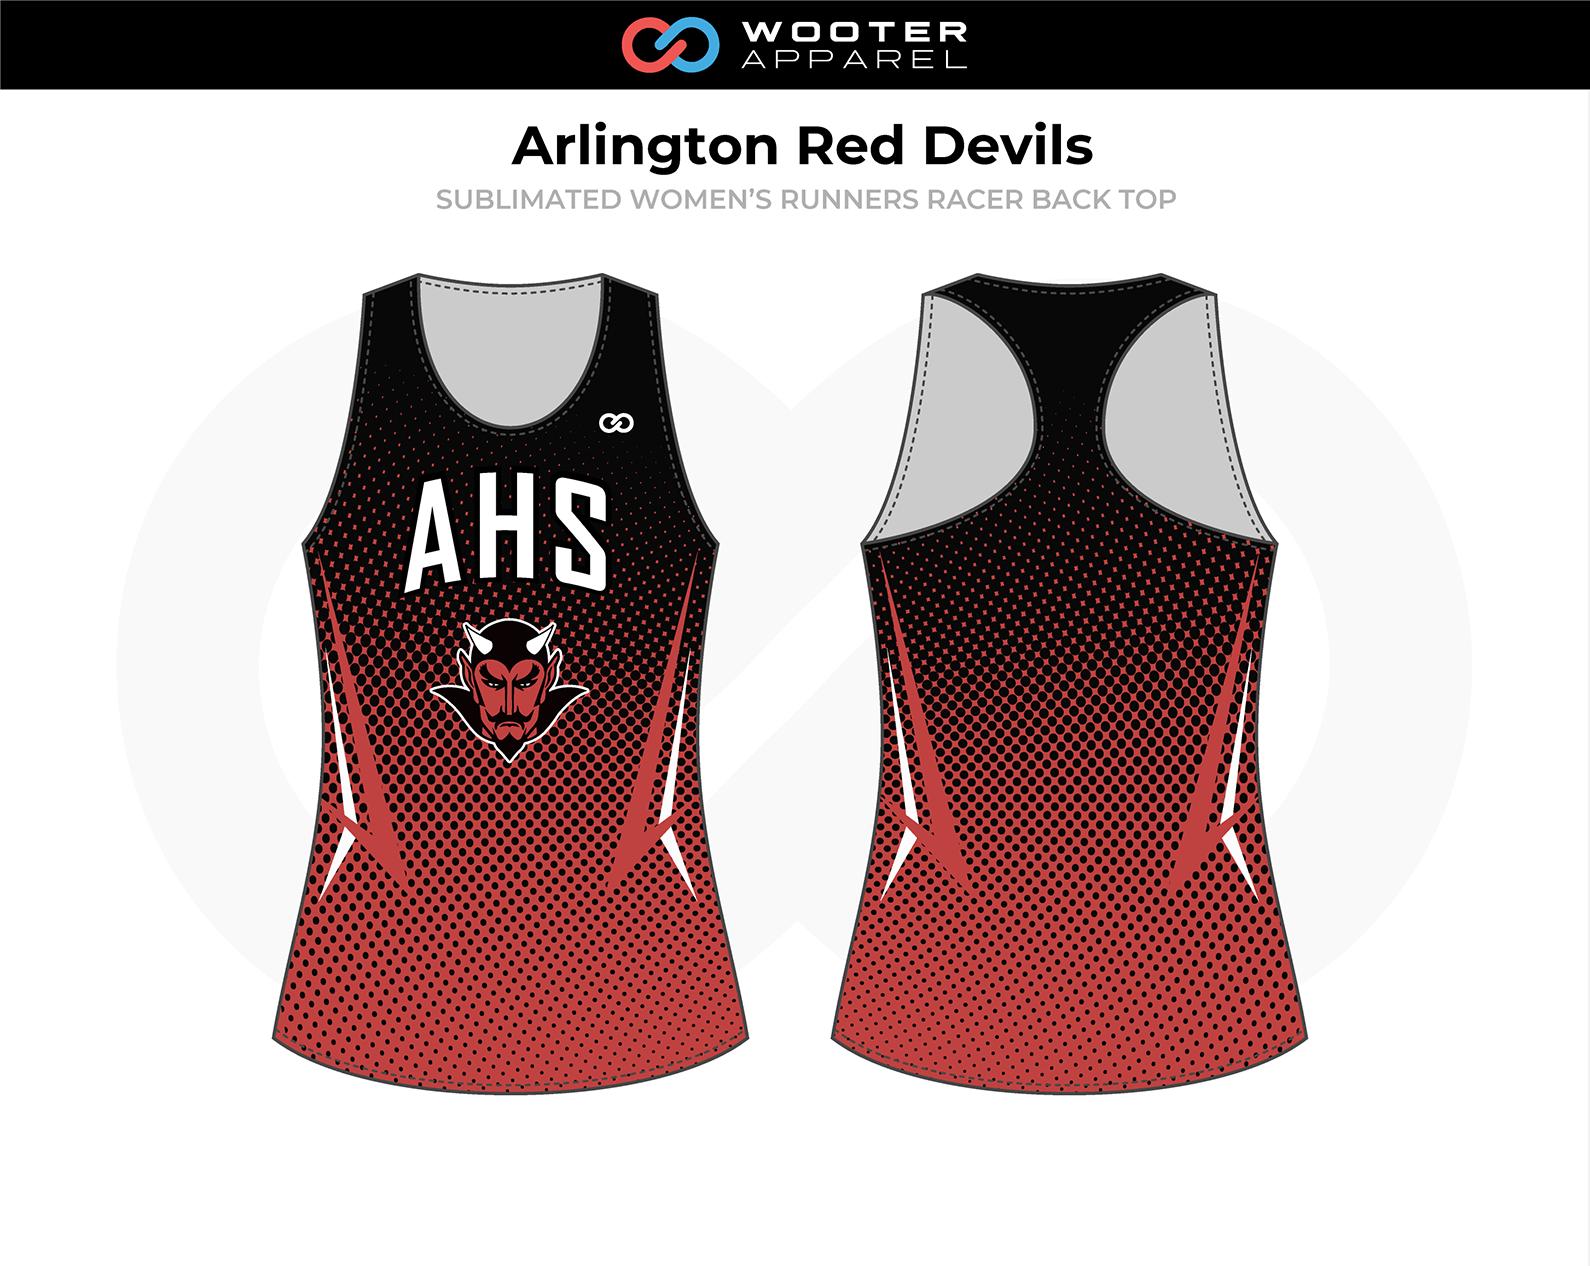 2018-12-17 Arlington Red Devils Running Top (C).png